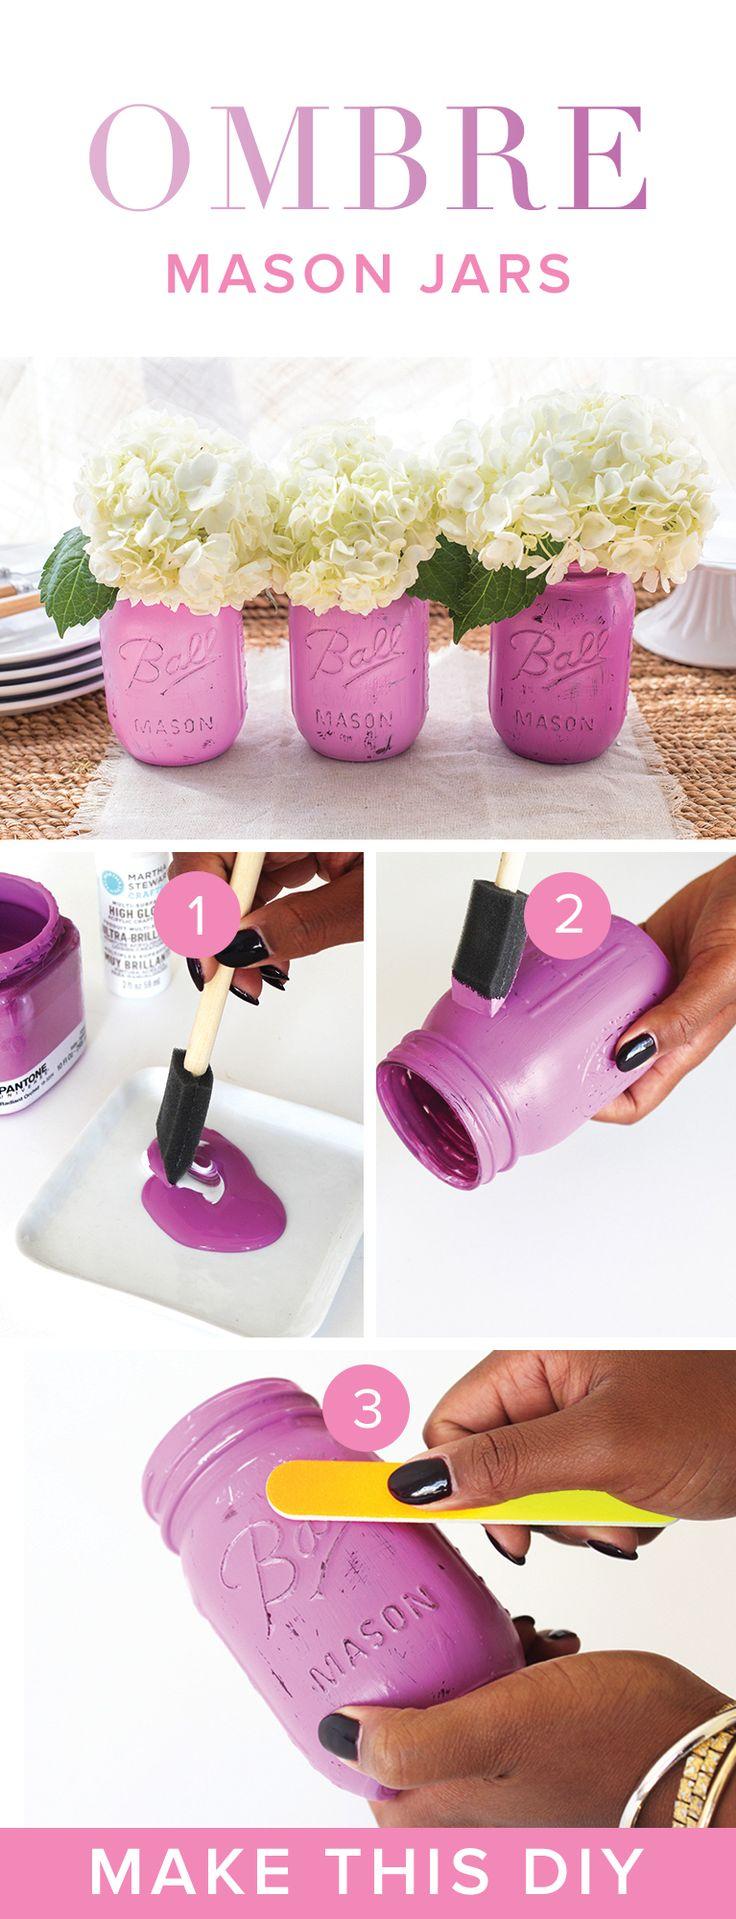 DIY Painted Mason Jar Vases | Darby Smart